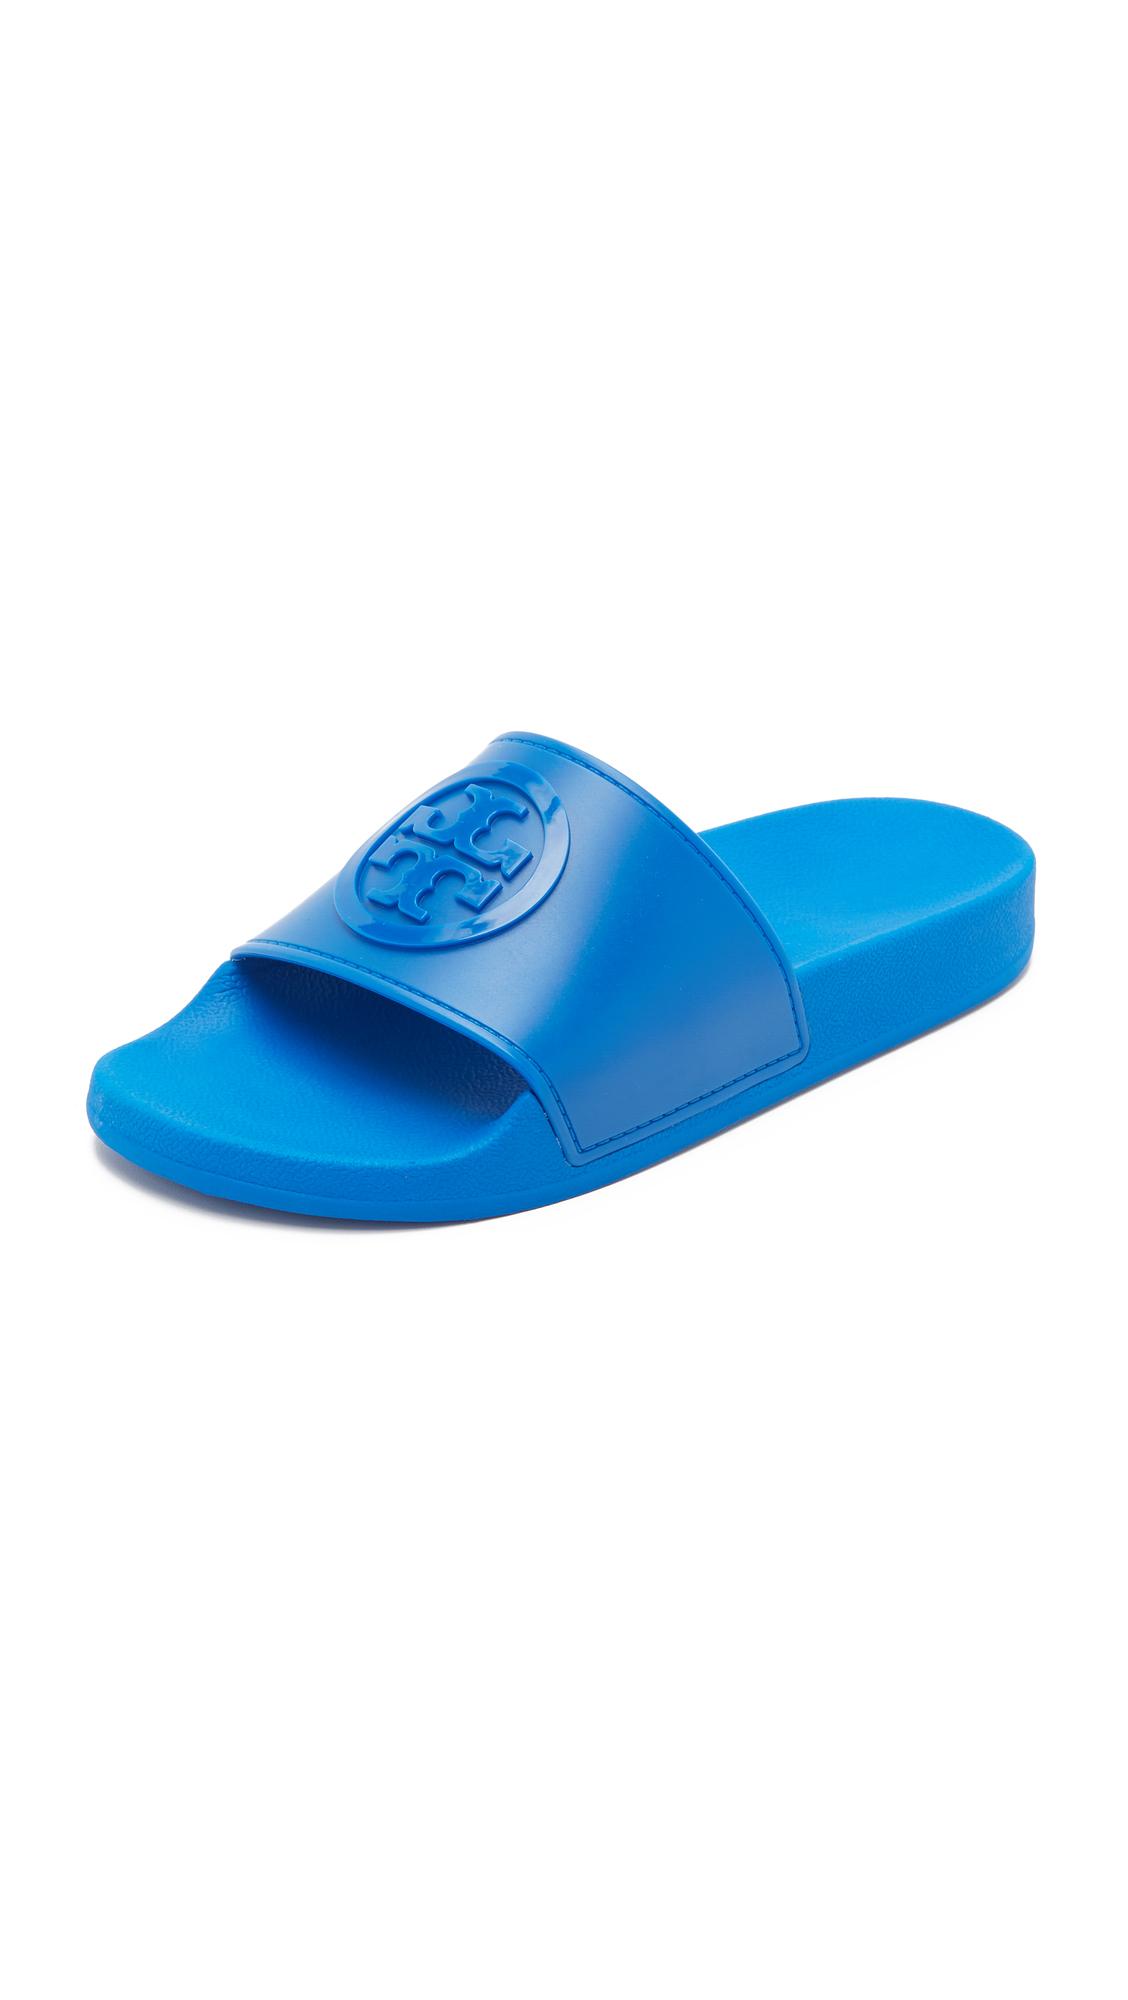 334279ee6c0007 Tory Burch Jelly Flat Slides